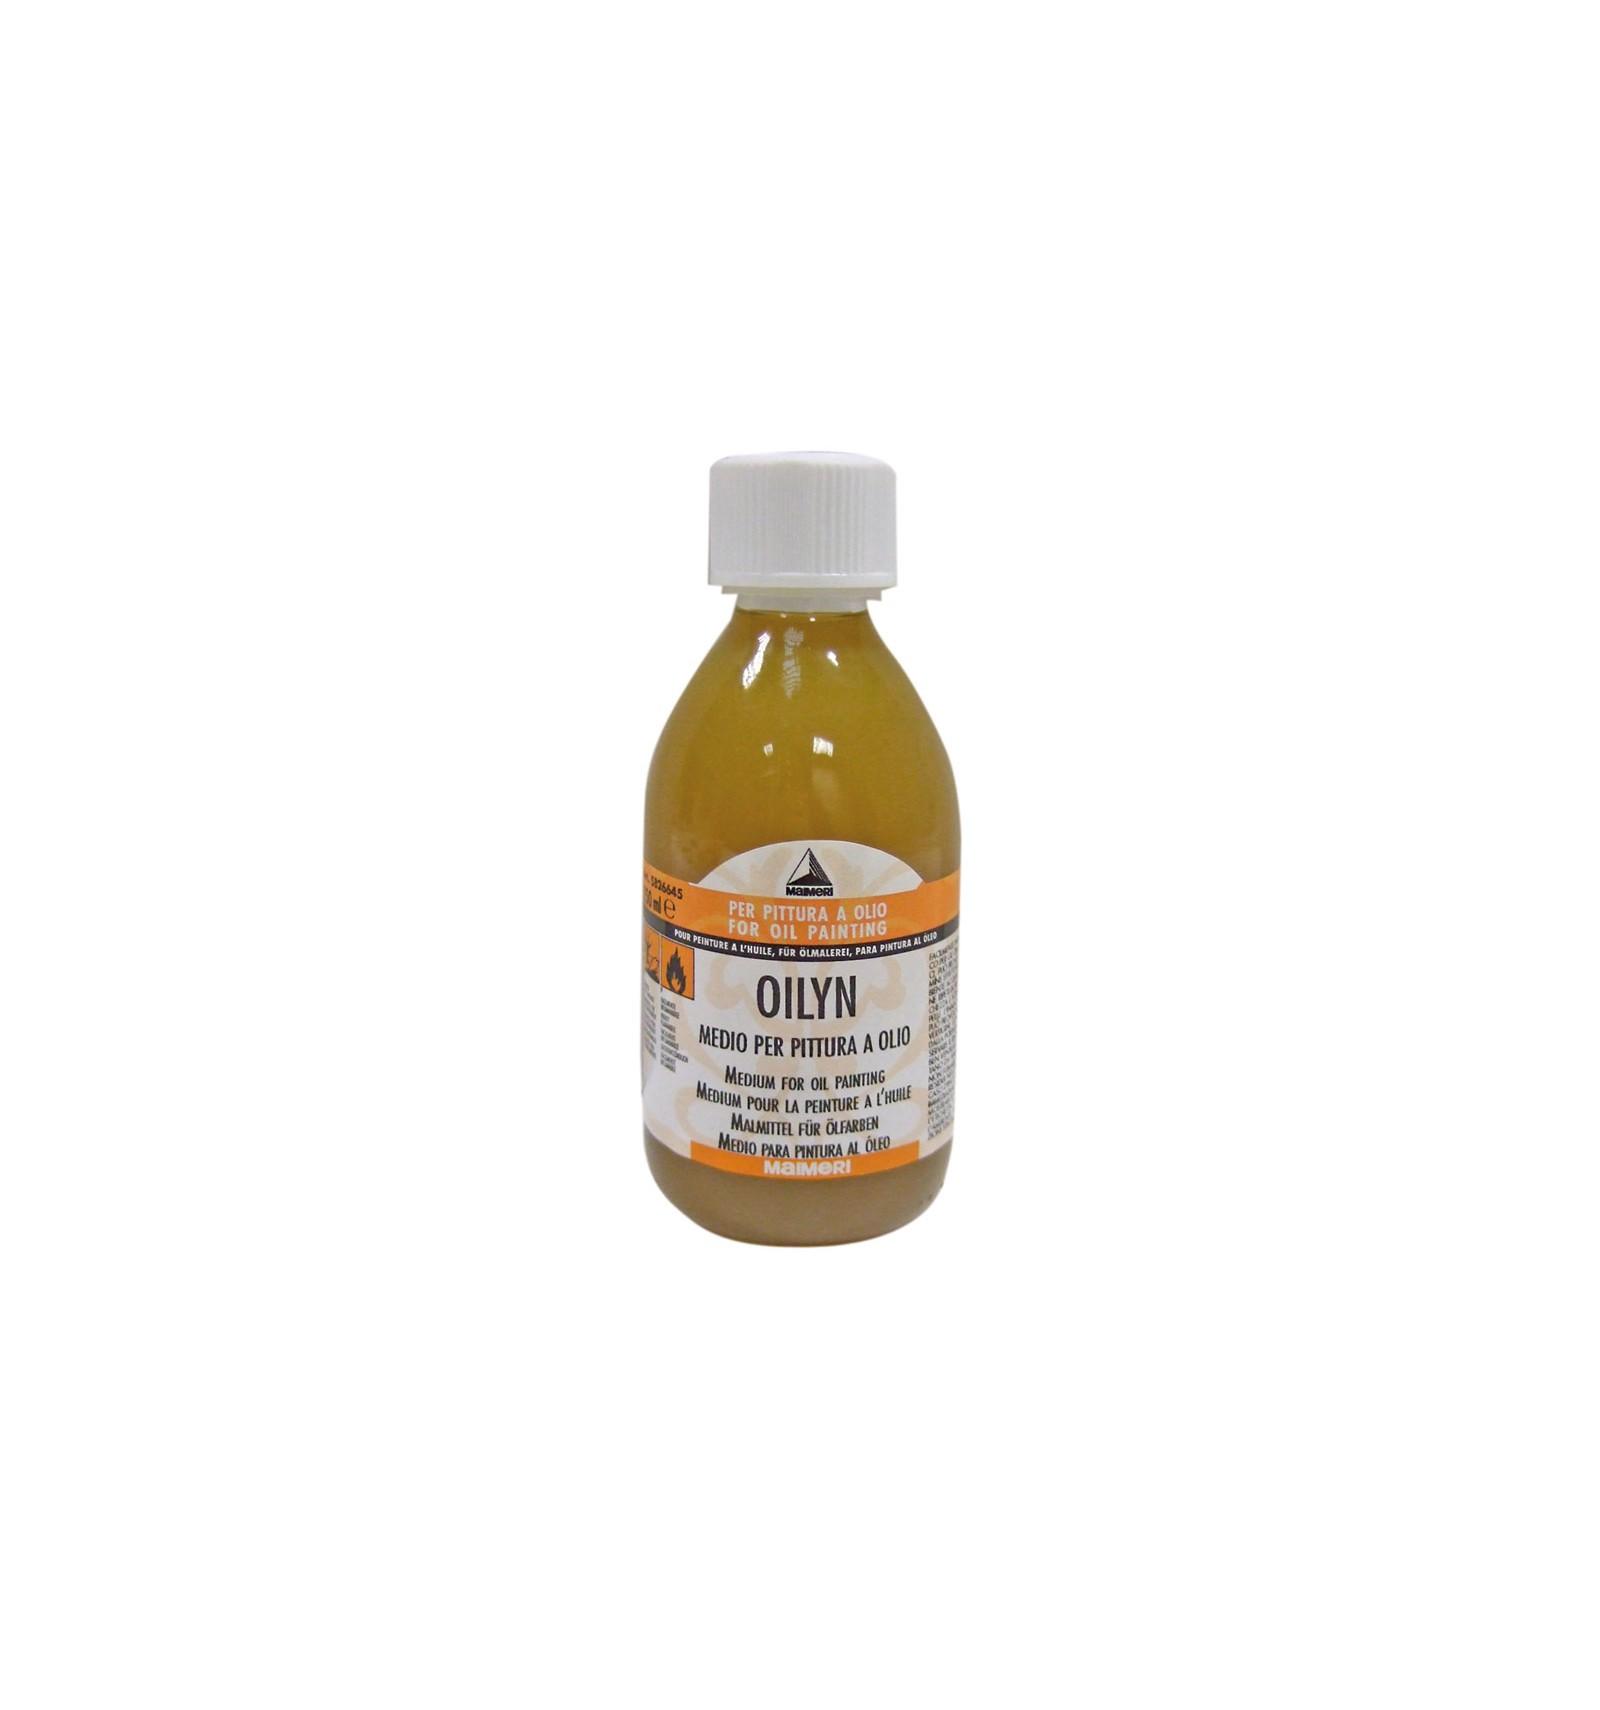 Ausiliari Colori Olio Oilyn Maimeri Ad Per 75ml wP80Onk